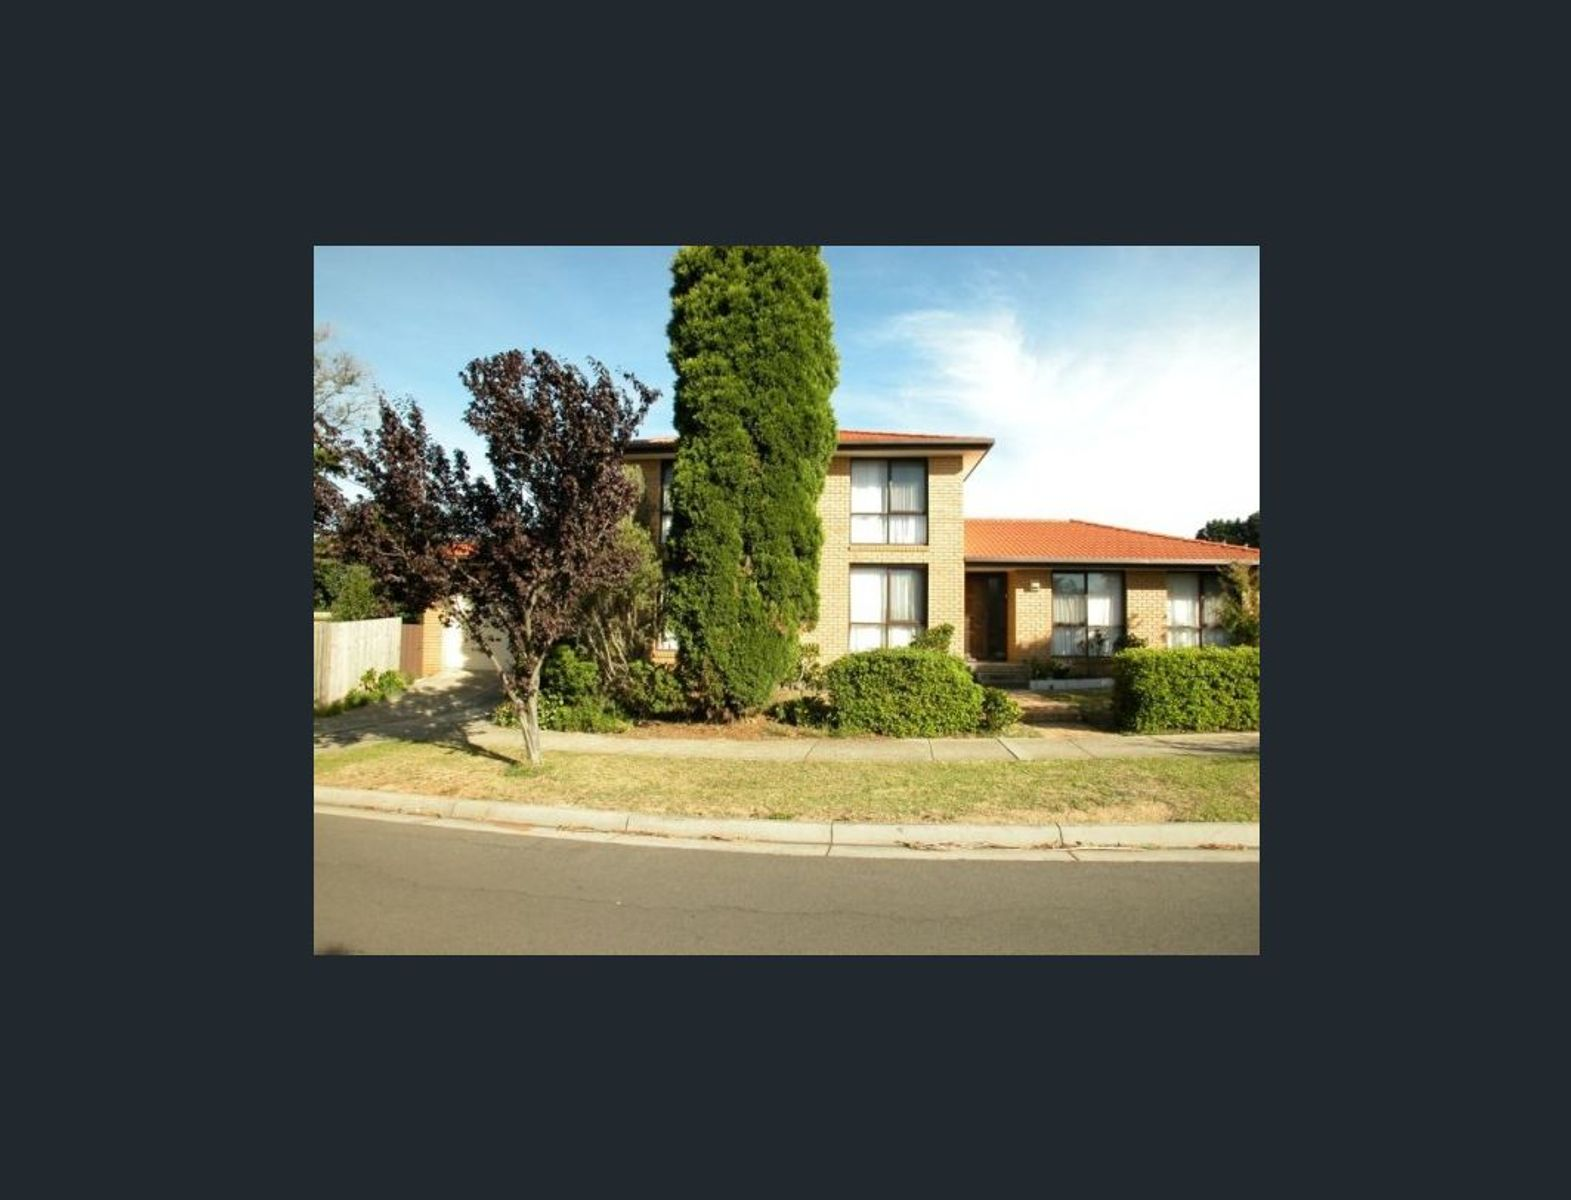 11 Mockridge Street, Wantirna South, VIC 3152